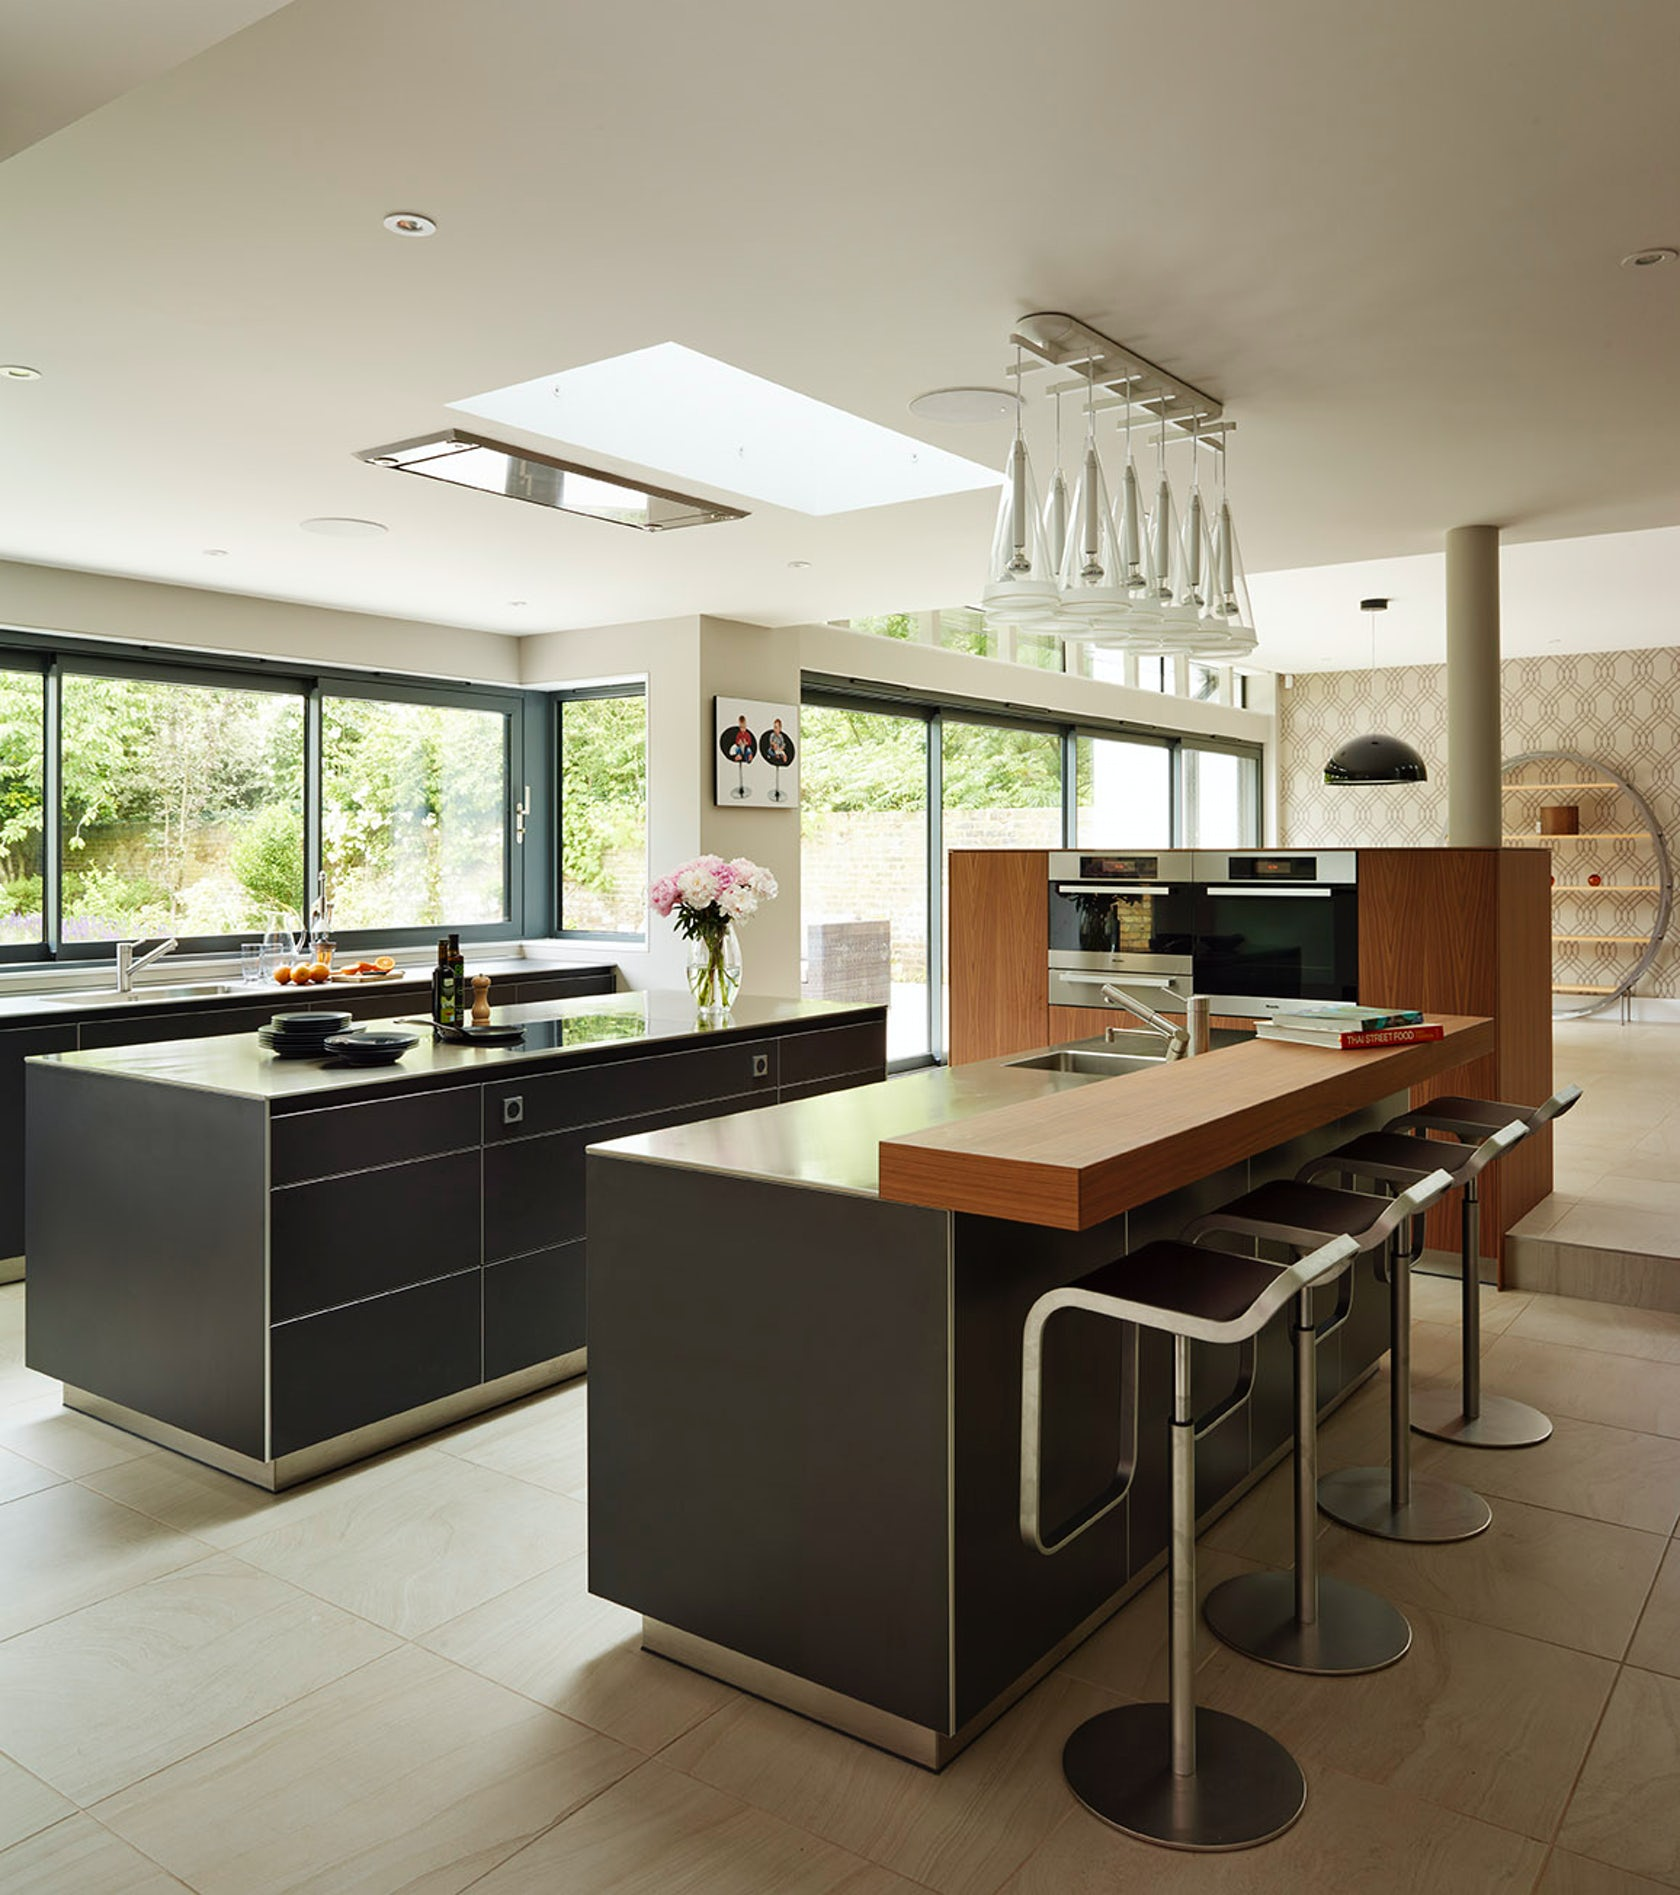 Kitchen Design Architecture: Island Living: Kitchen Architecture's Bulthaup B3